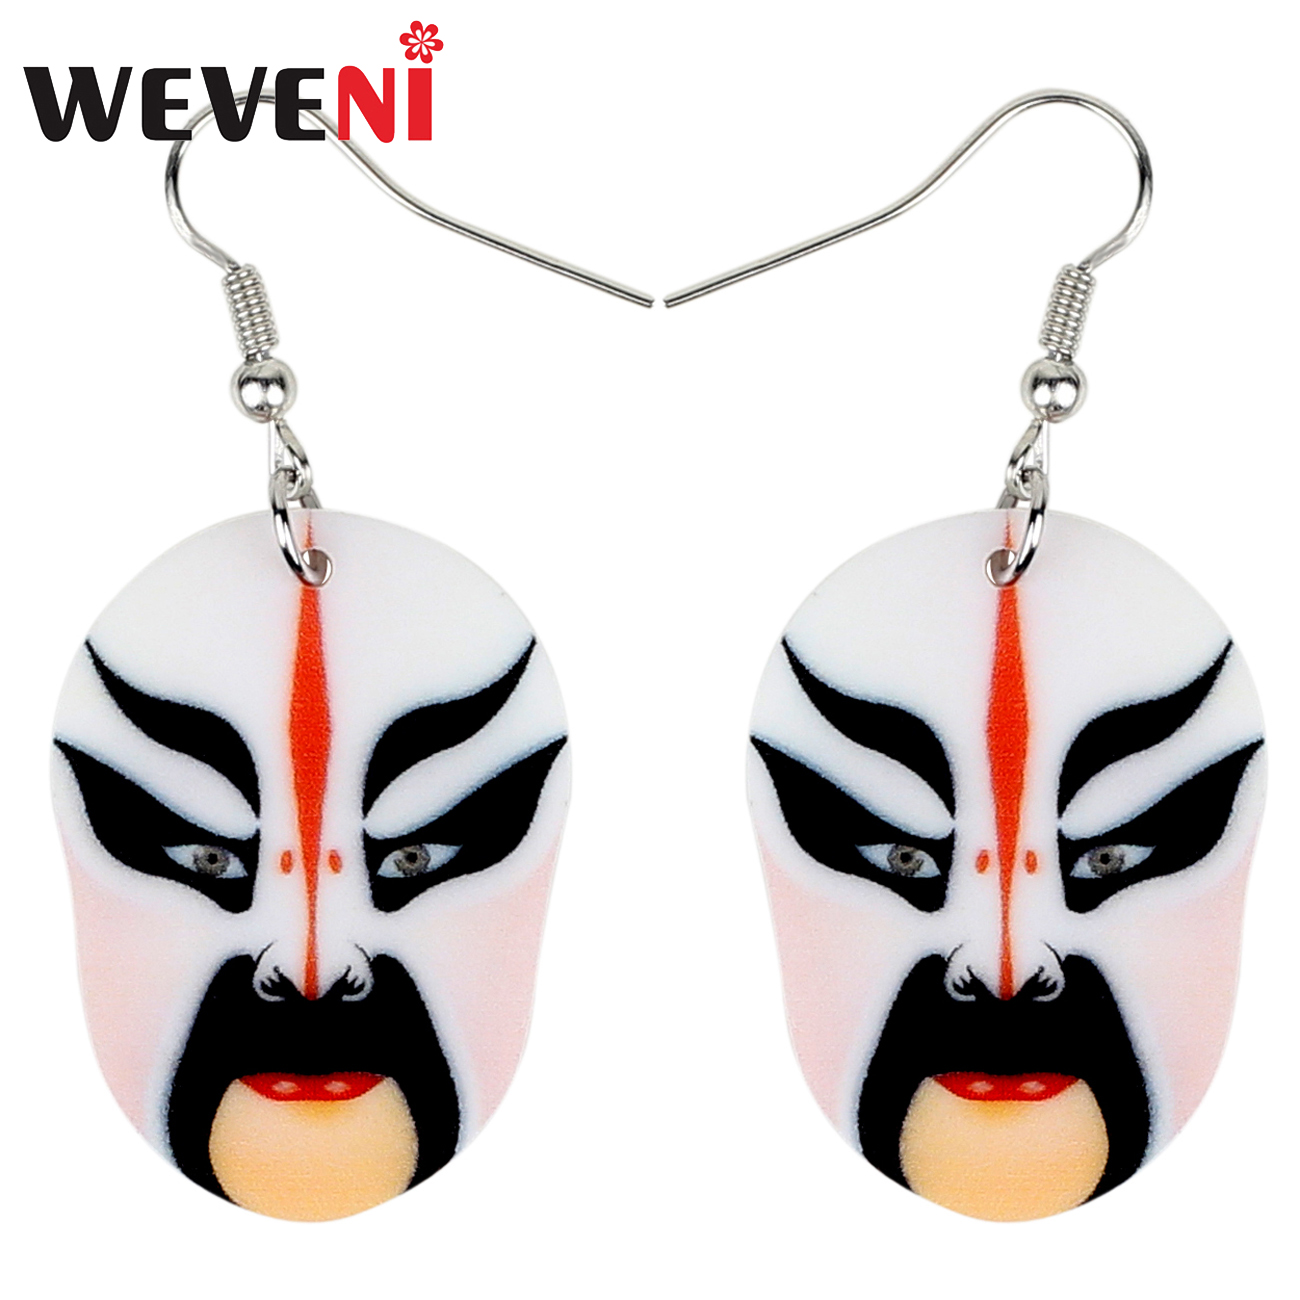 WEVENI Acrylic Fashion Chinese Beijing Opera Mask Earrings Drop Dangle Ancient Character Jewelry For Women Girls Gift Charms New